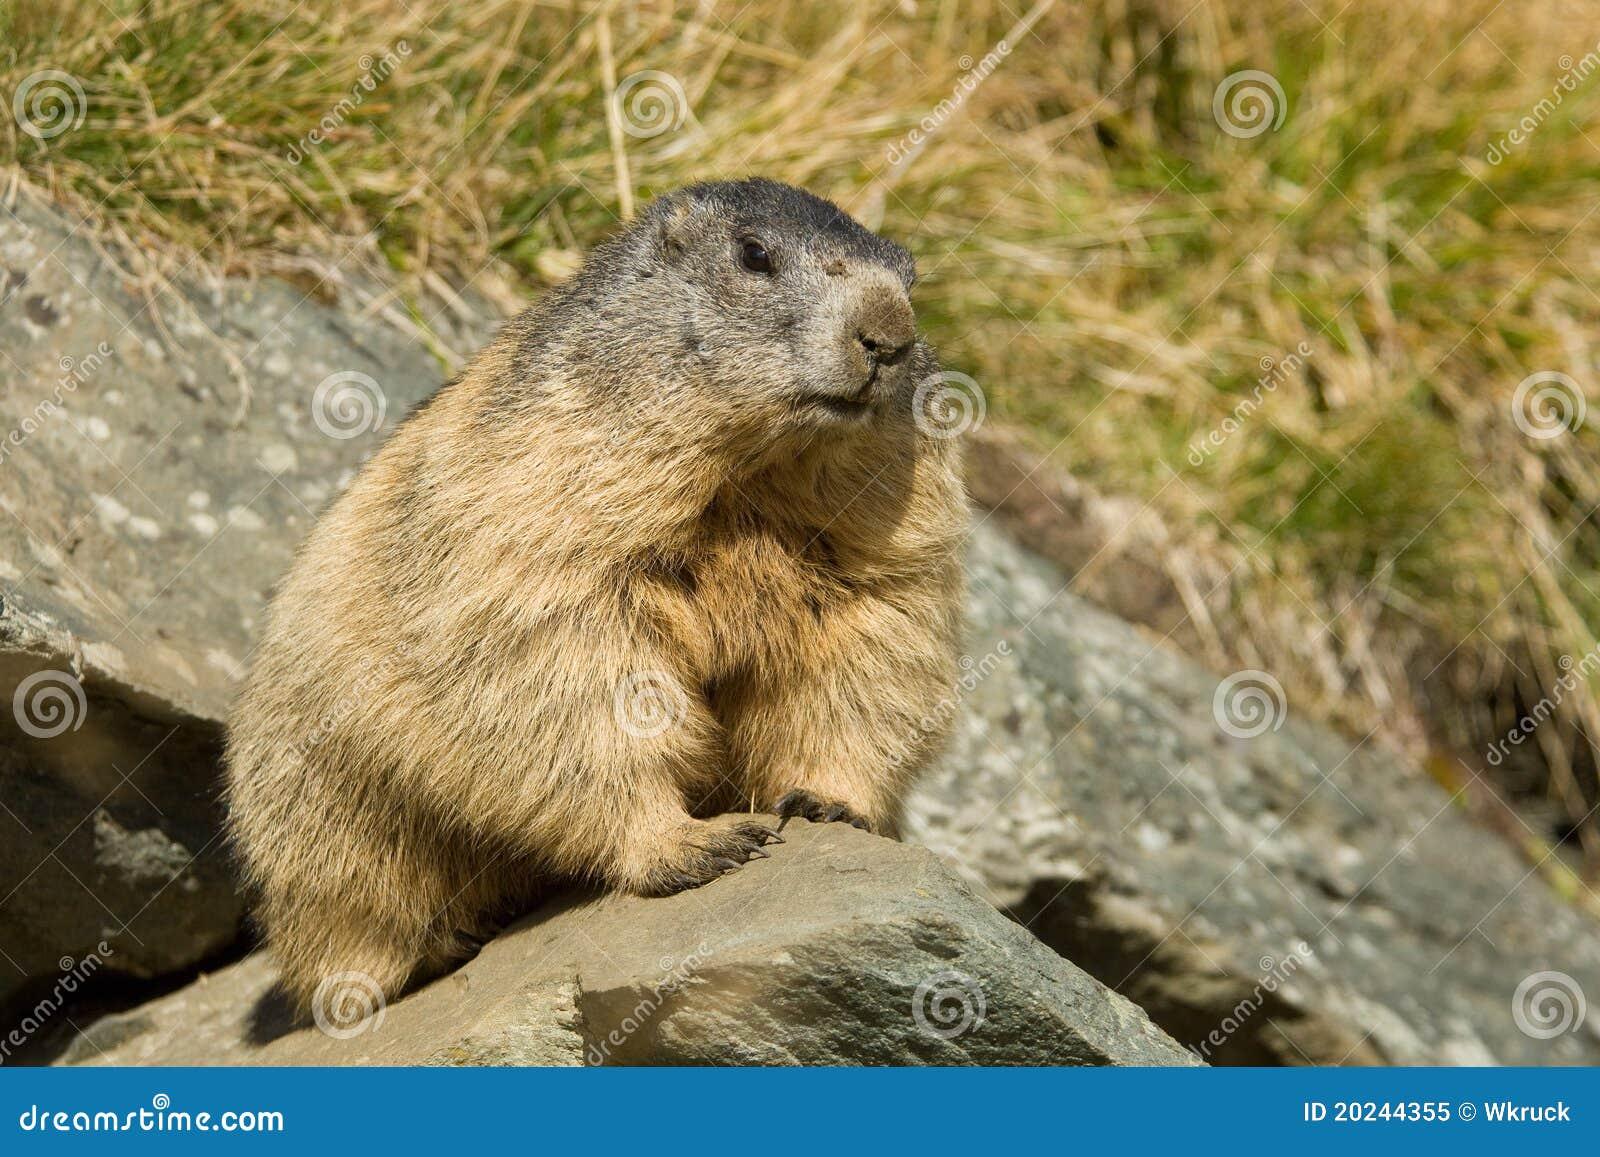 Alpine Marmot Royalty Free Stock Photo - Image: 20244355